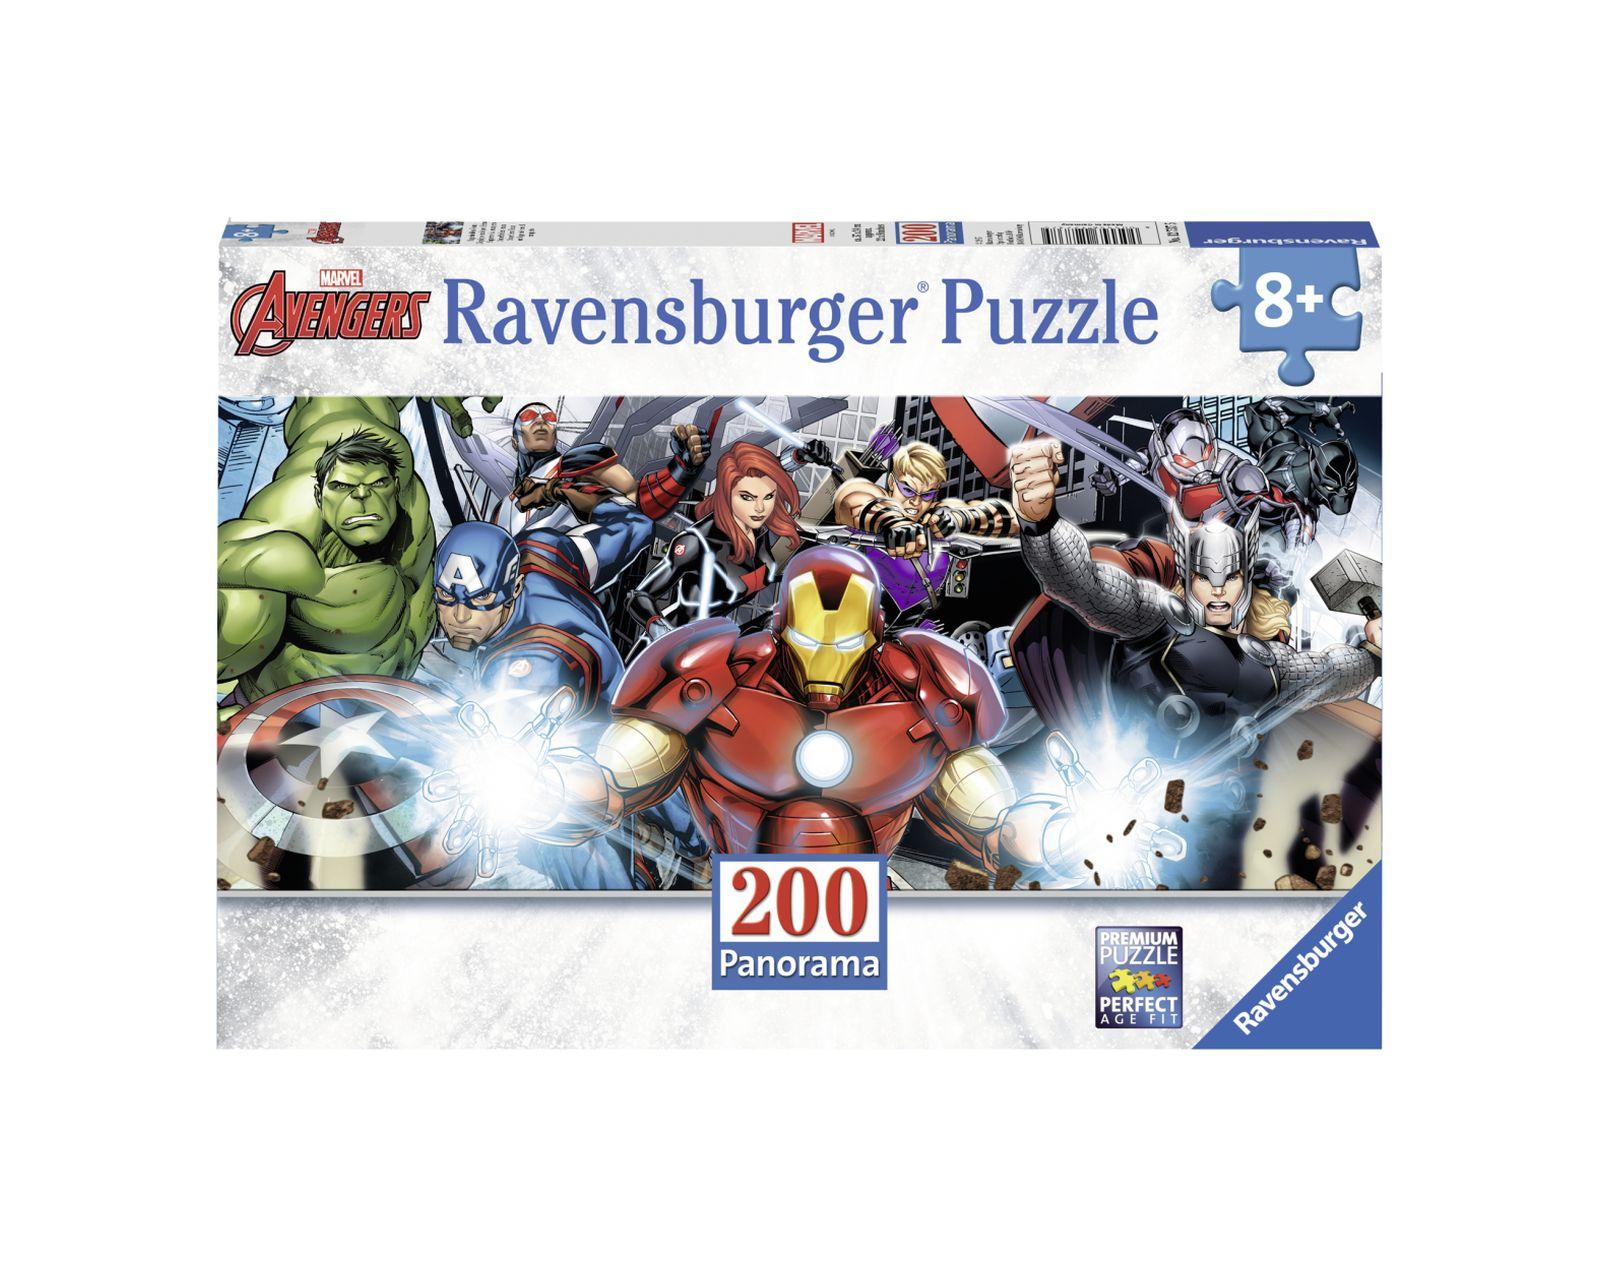 Ravensburger - puzzle 200 pezzi xxl - avengers panorama - Ravensburger1